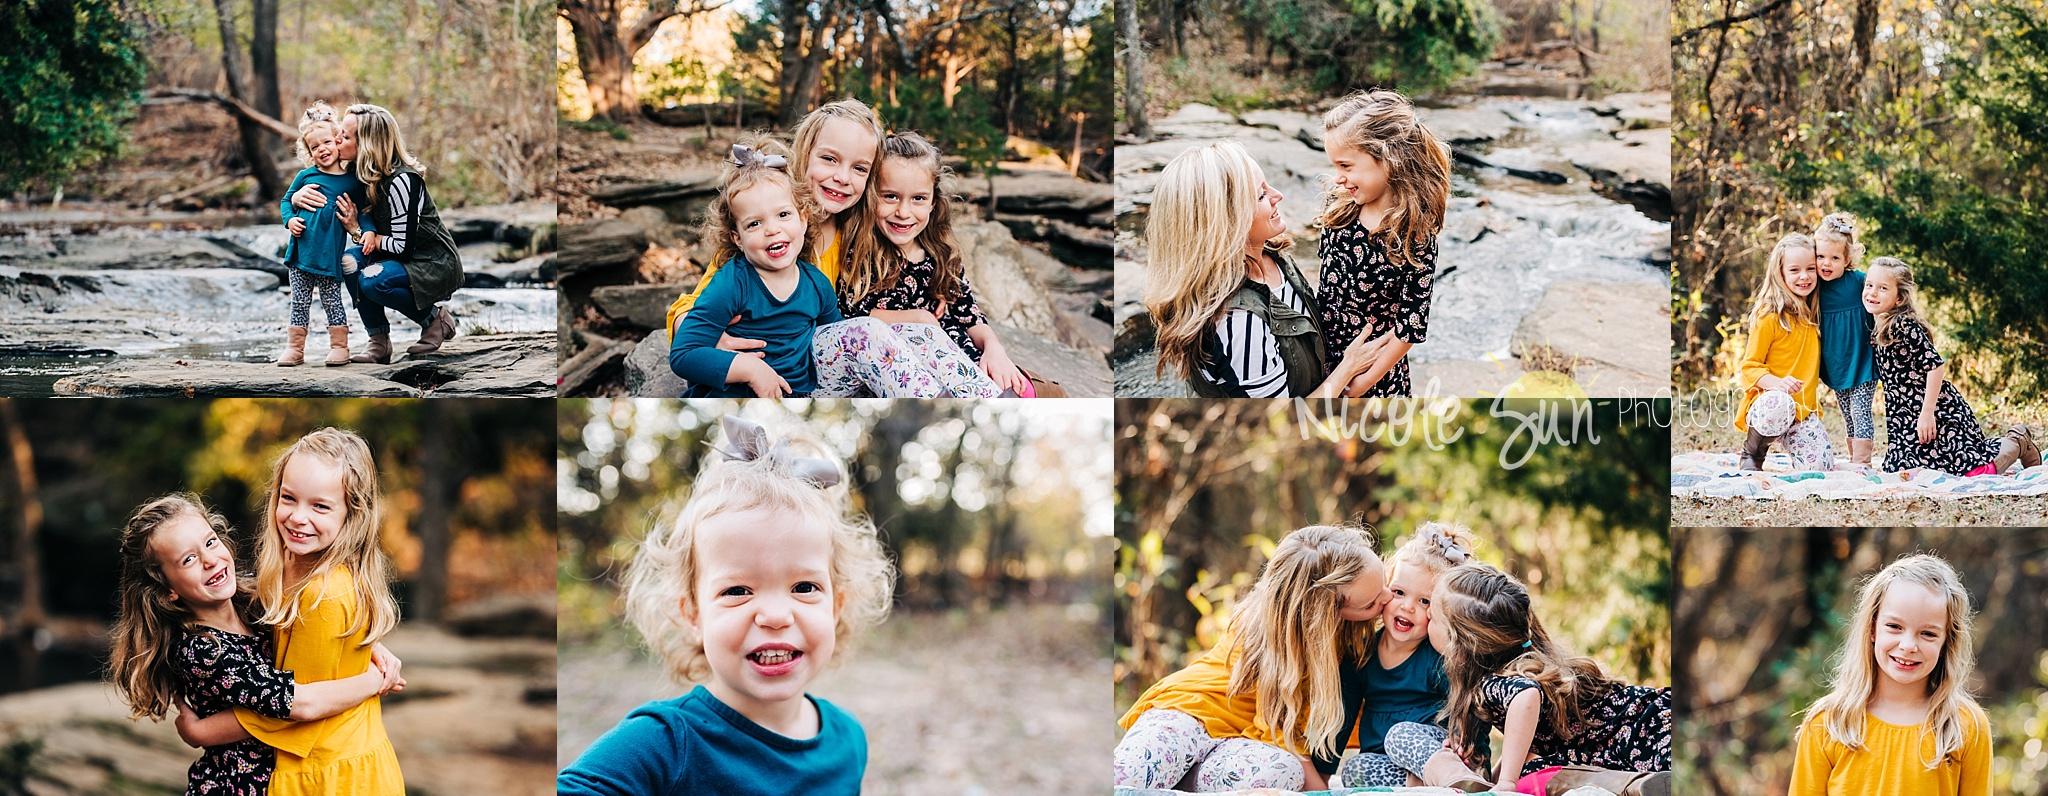 dfwfamilyoutdoorphotographer.jpg